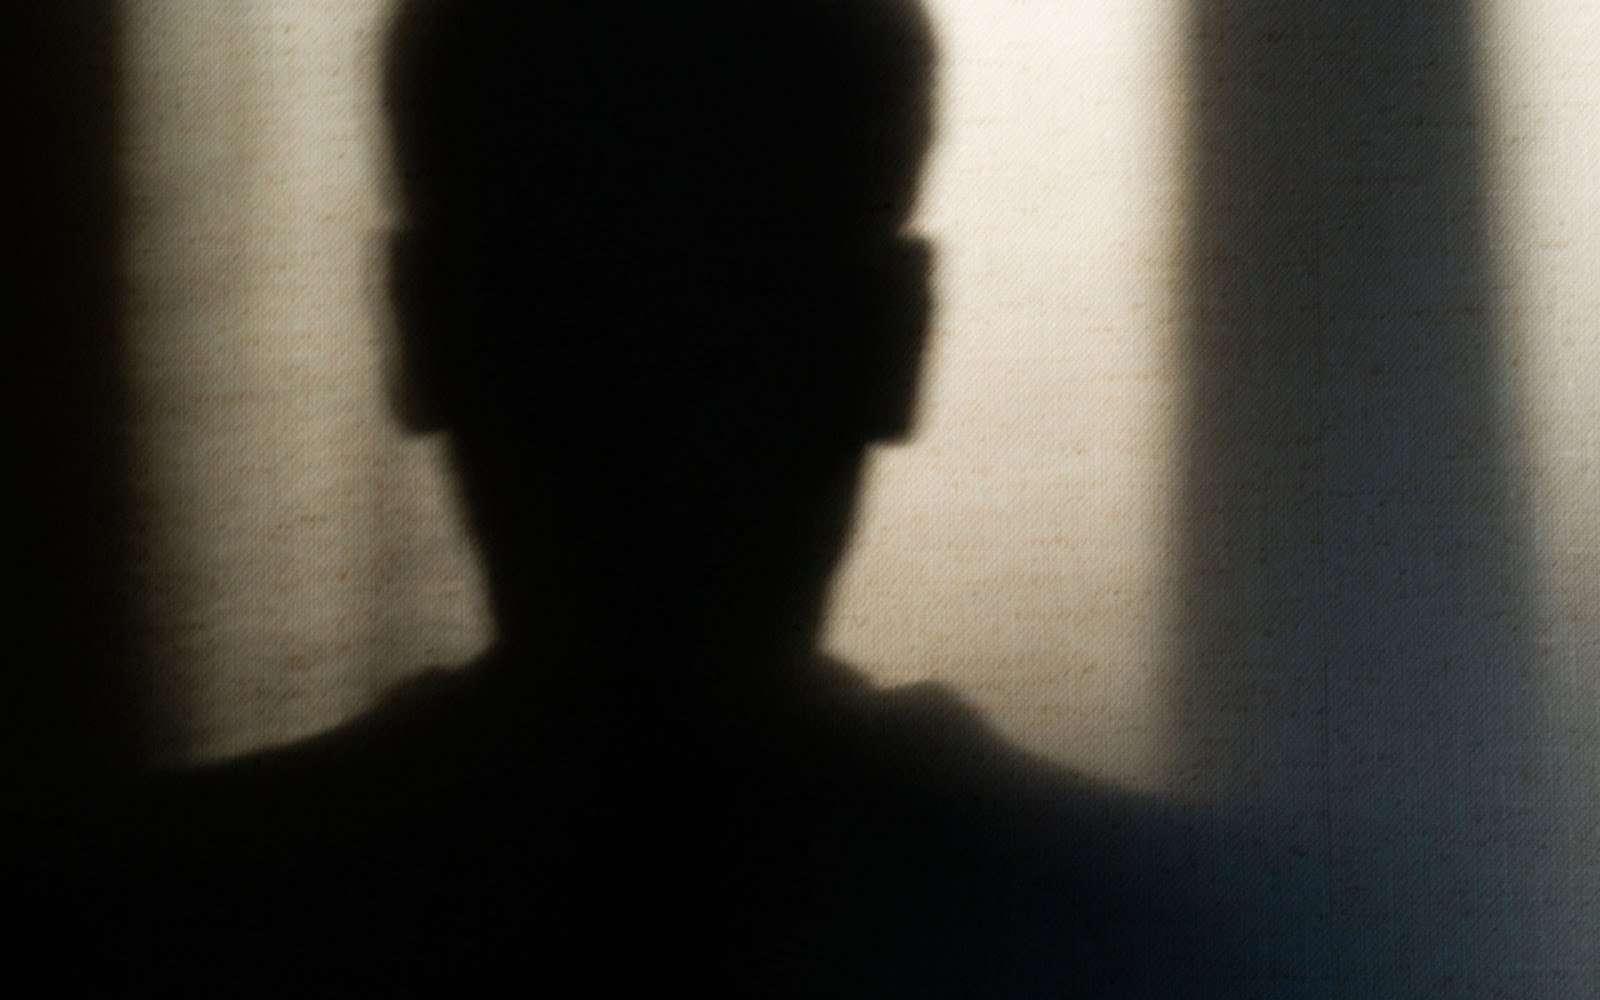 Portmore Citizens' Association Calls Emergency Meeting Over Serial Rapist